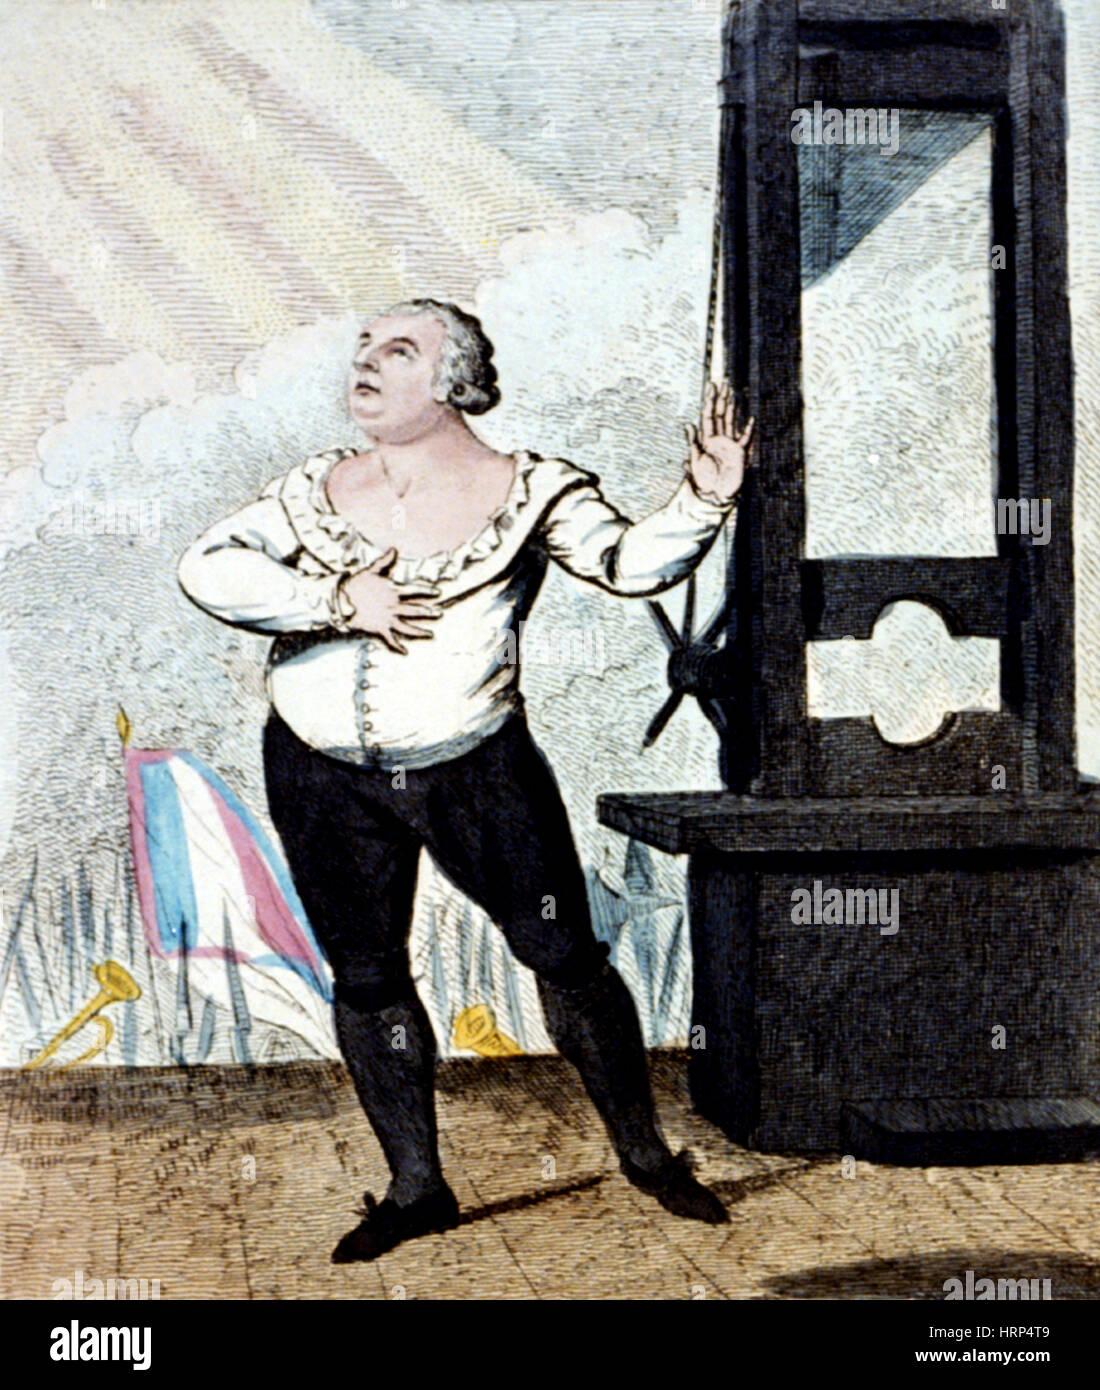 French Revolution, Execution of Louis XVI, 1793 - Stock Image